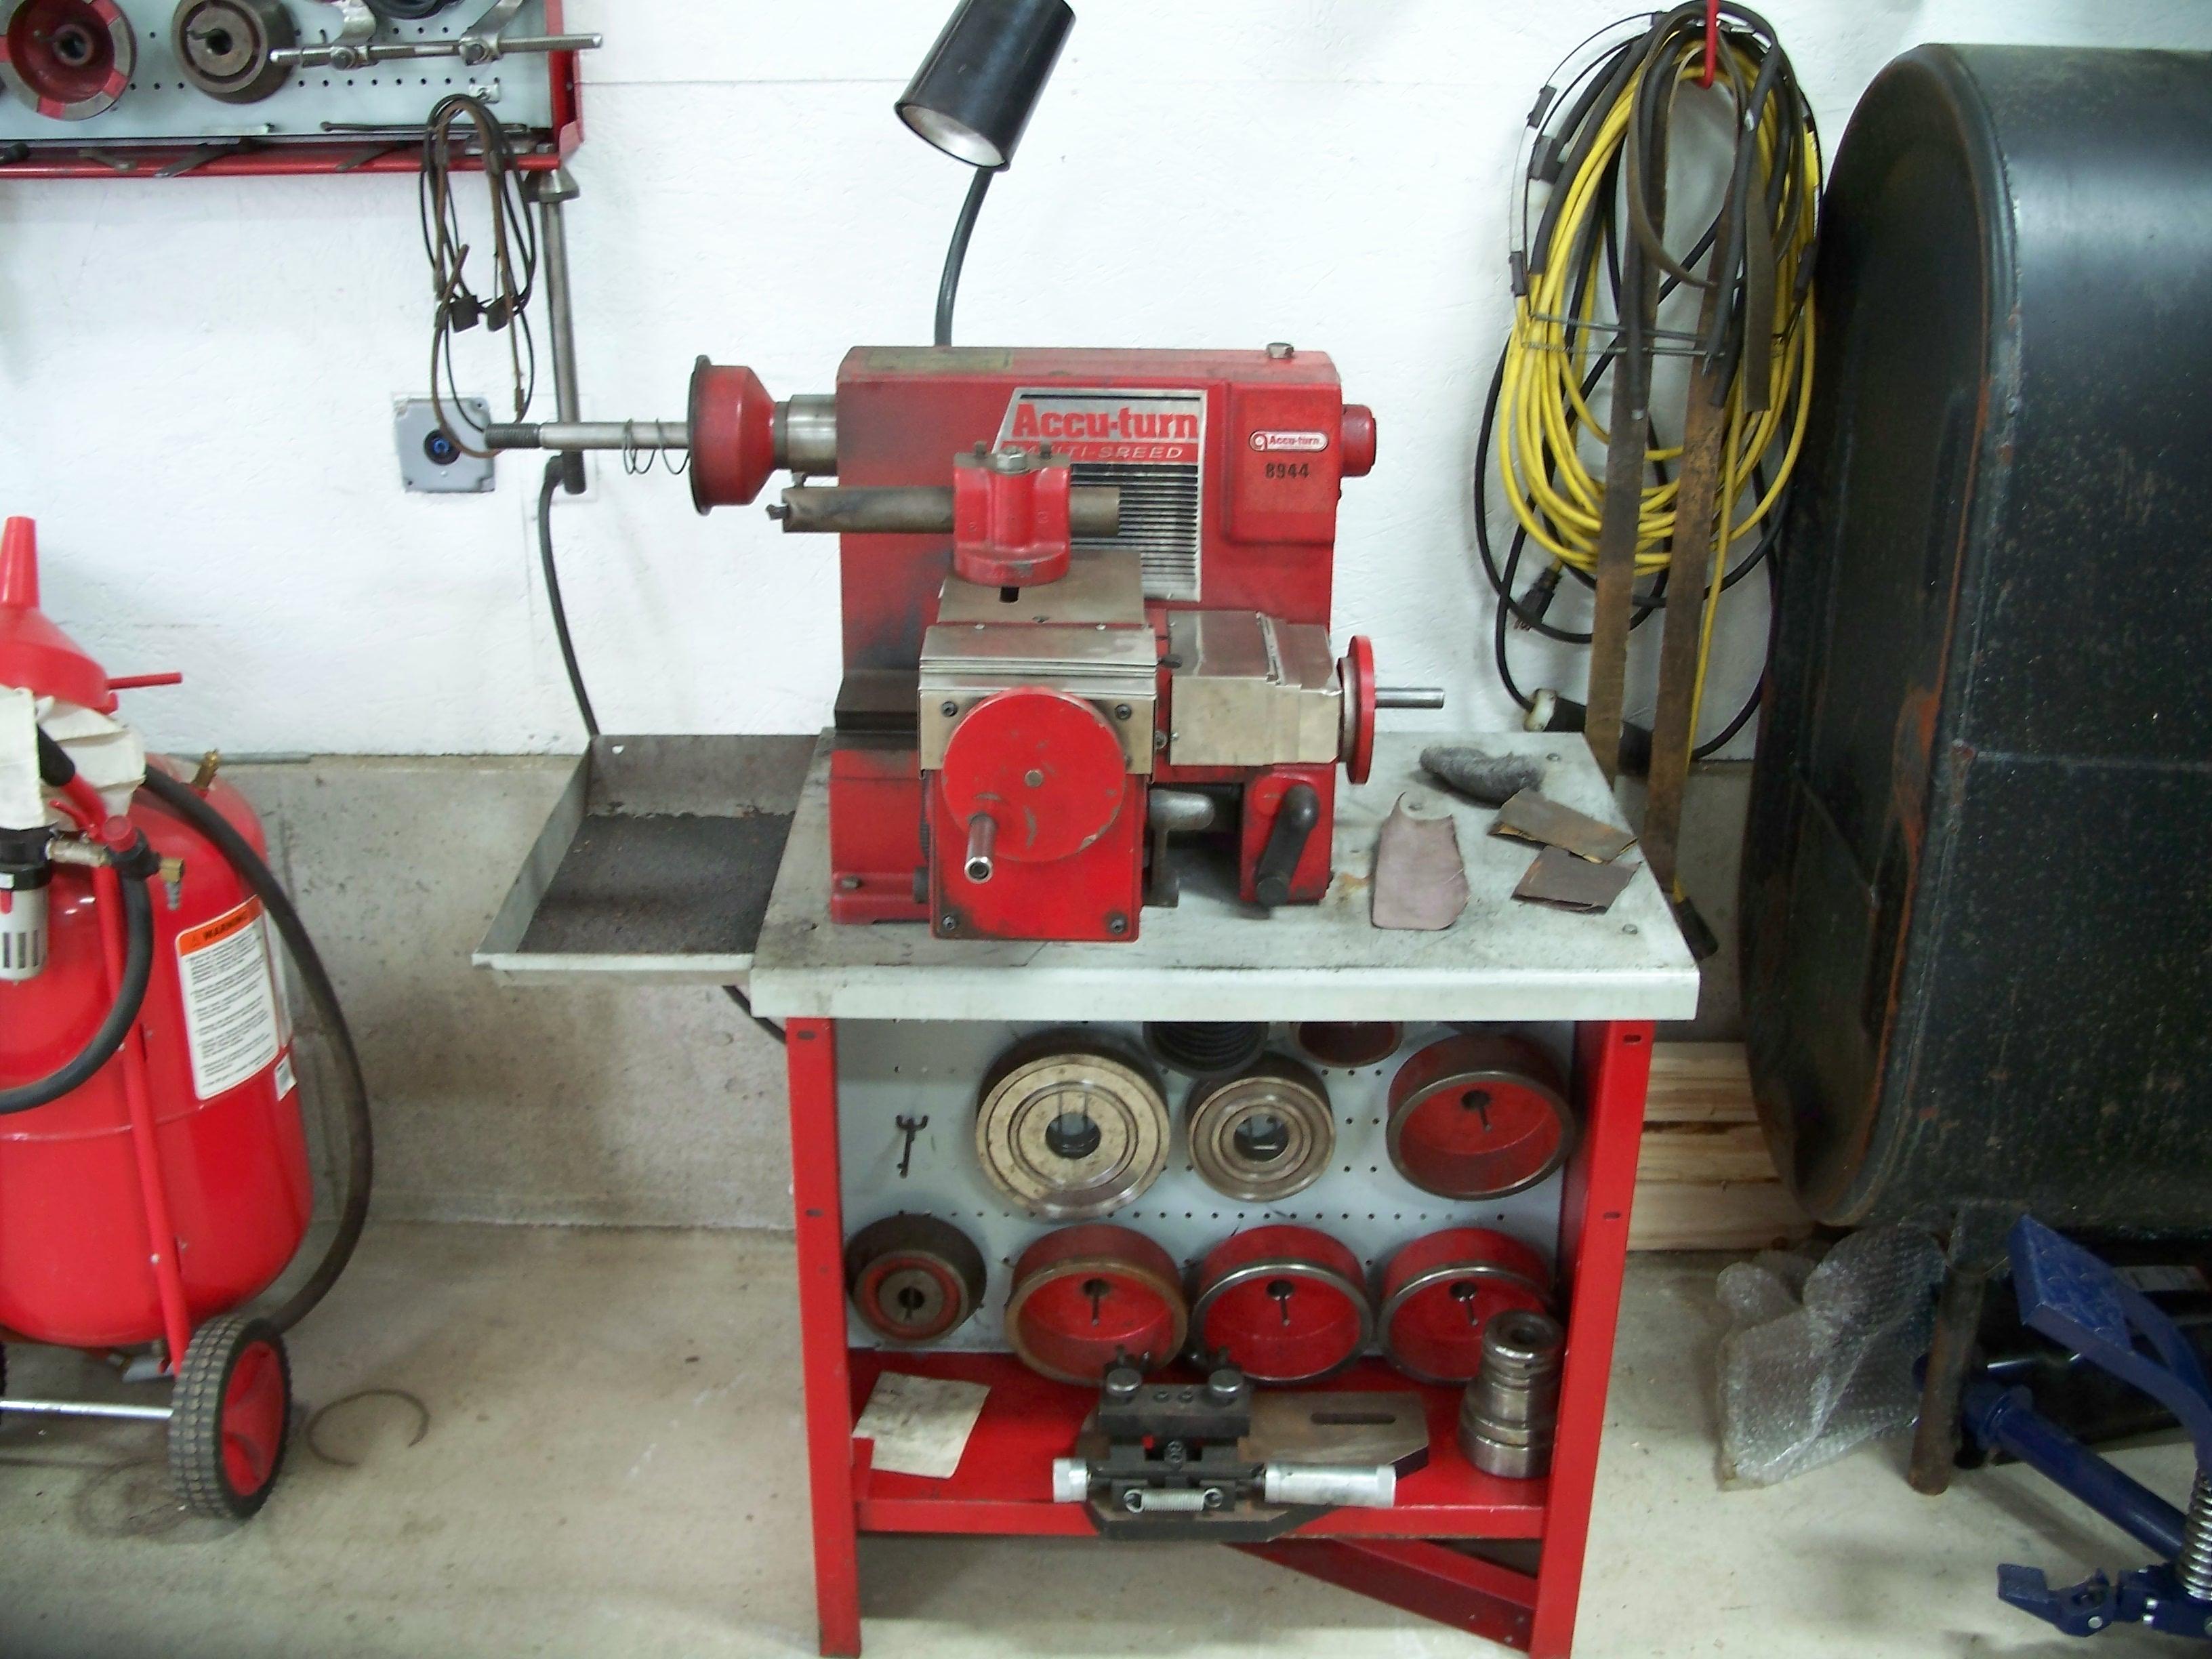 Brake Lathe Accu Turn Model 8944